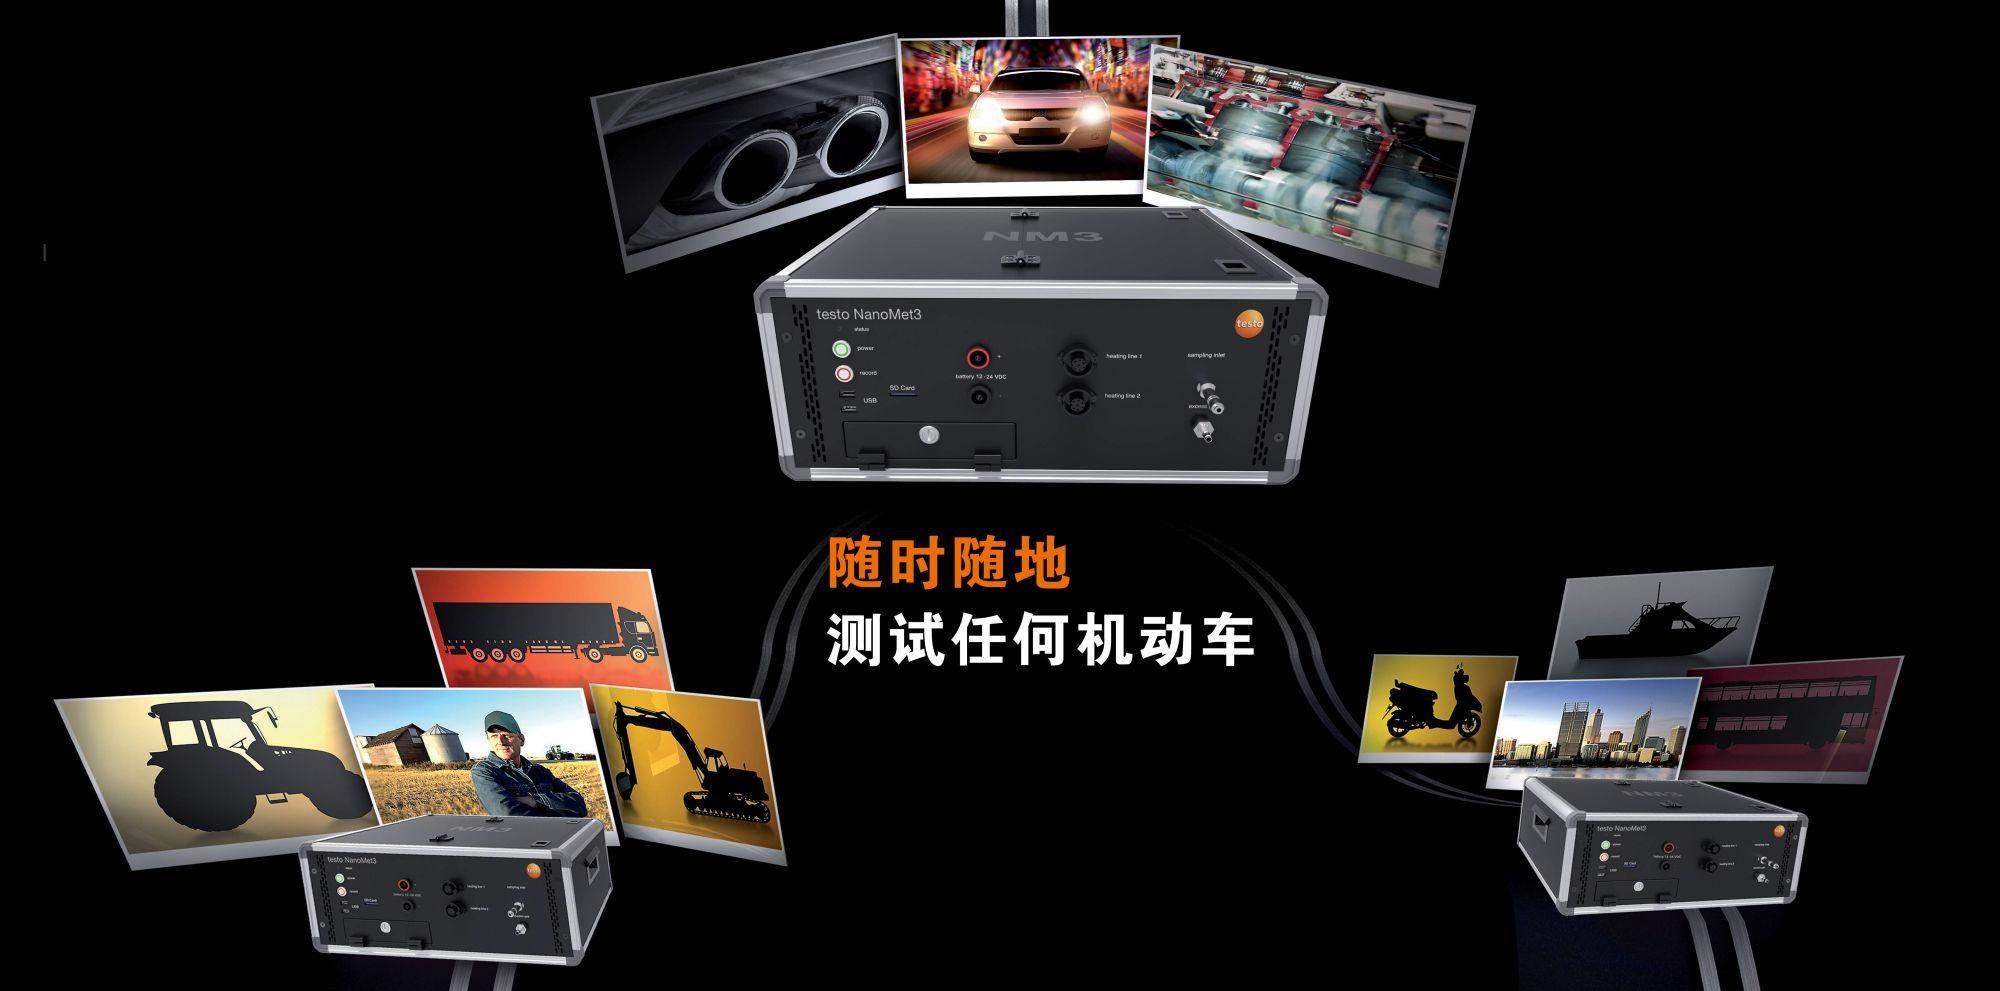 cn_company_news_2016_nano_partical_banner01.jpg